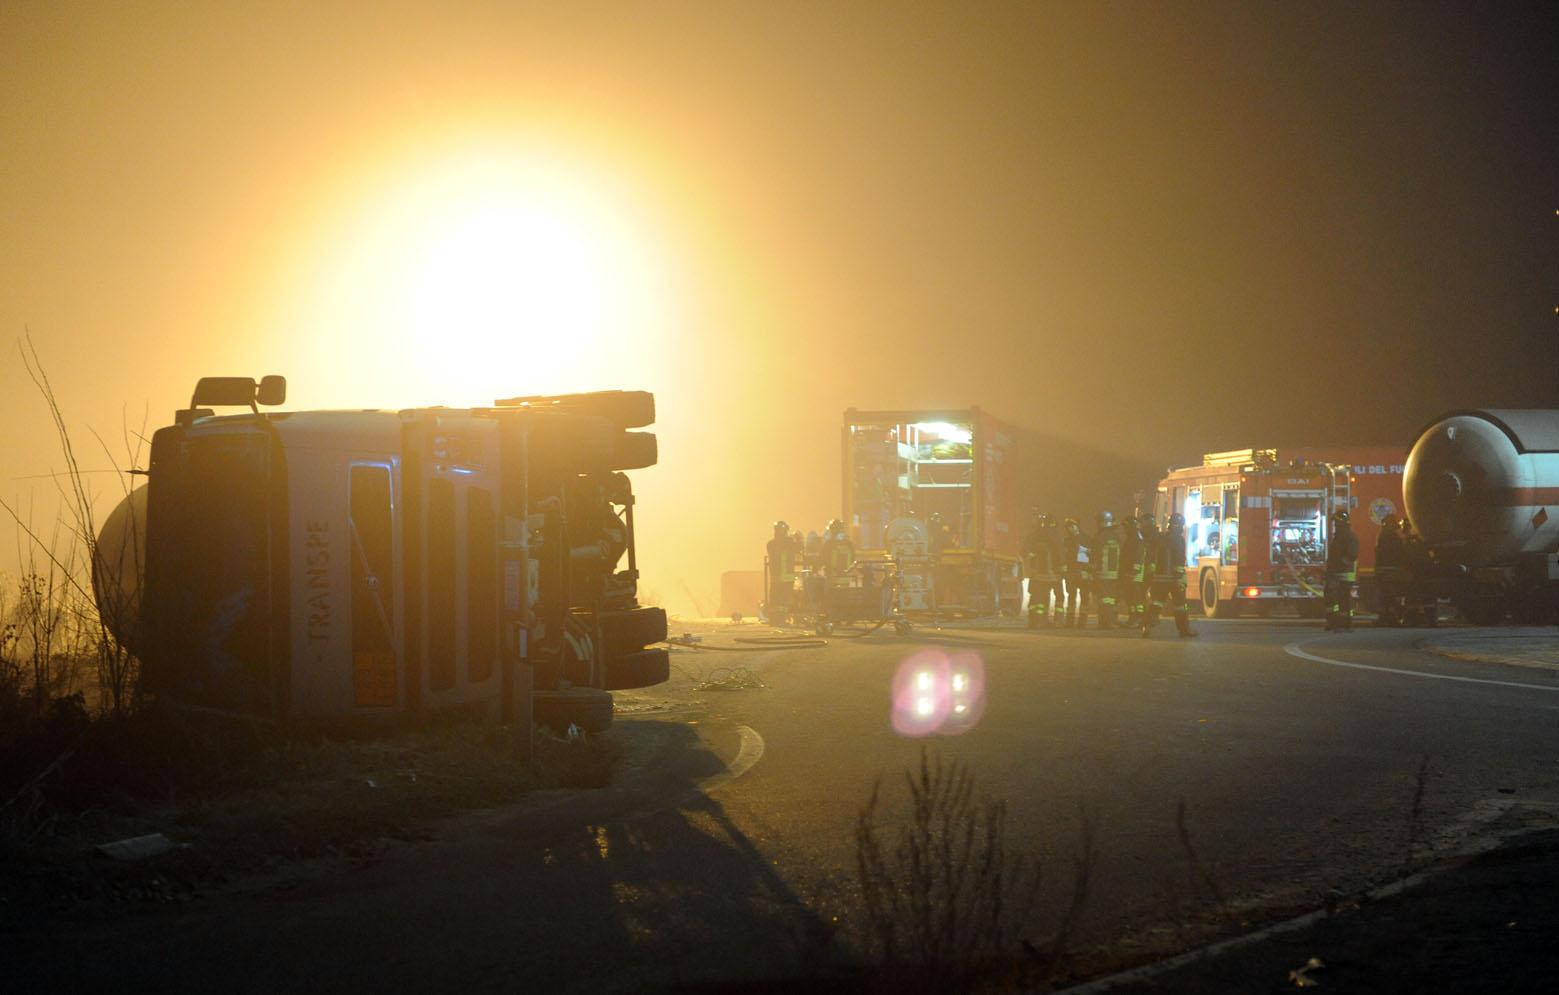 Incidente in A21: 6 morti, anche 2 bimbi